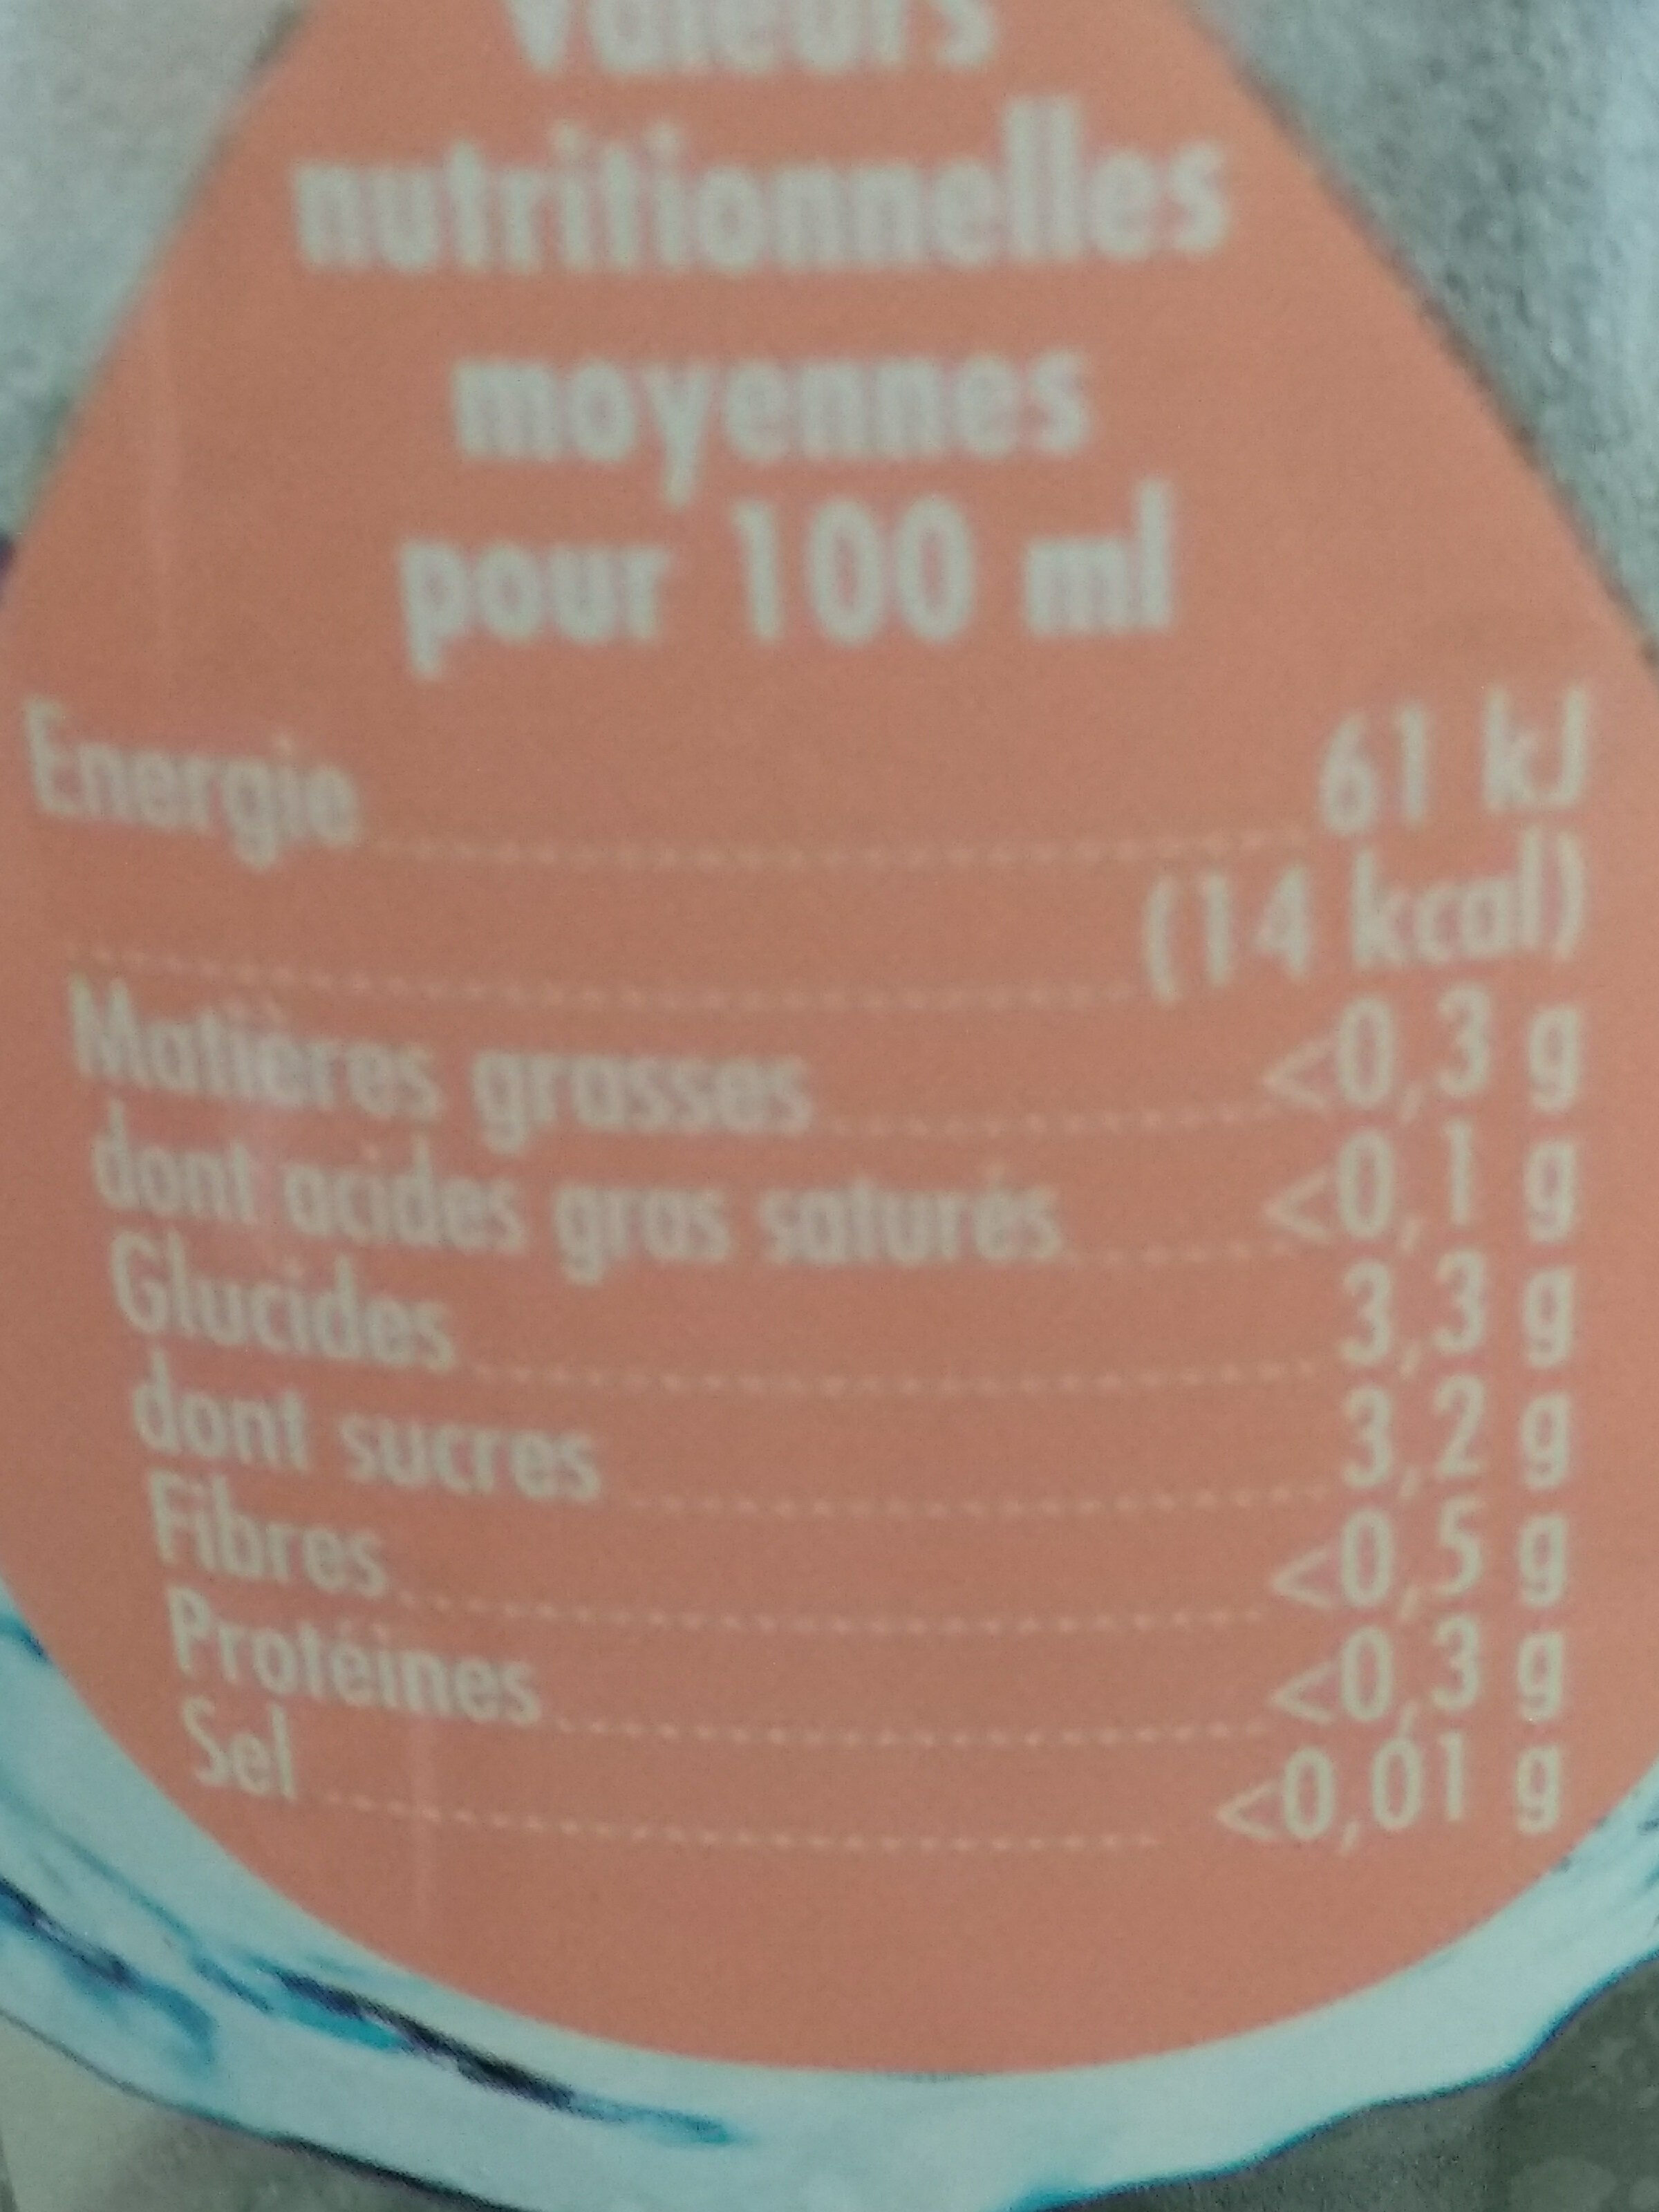 Luchon - Informations nutritionnelles - fr